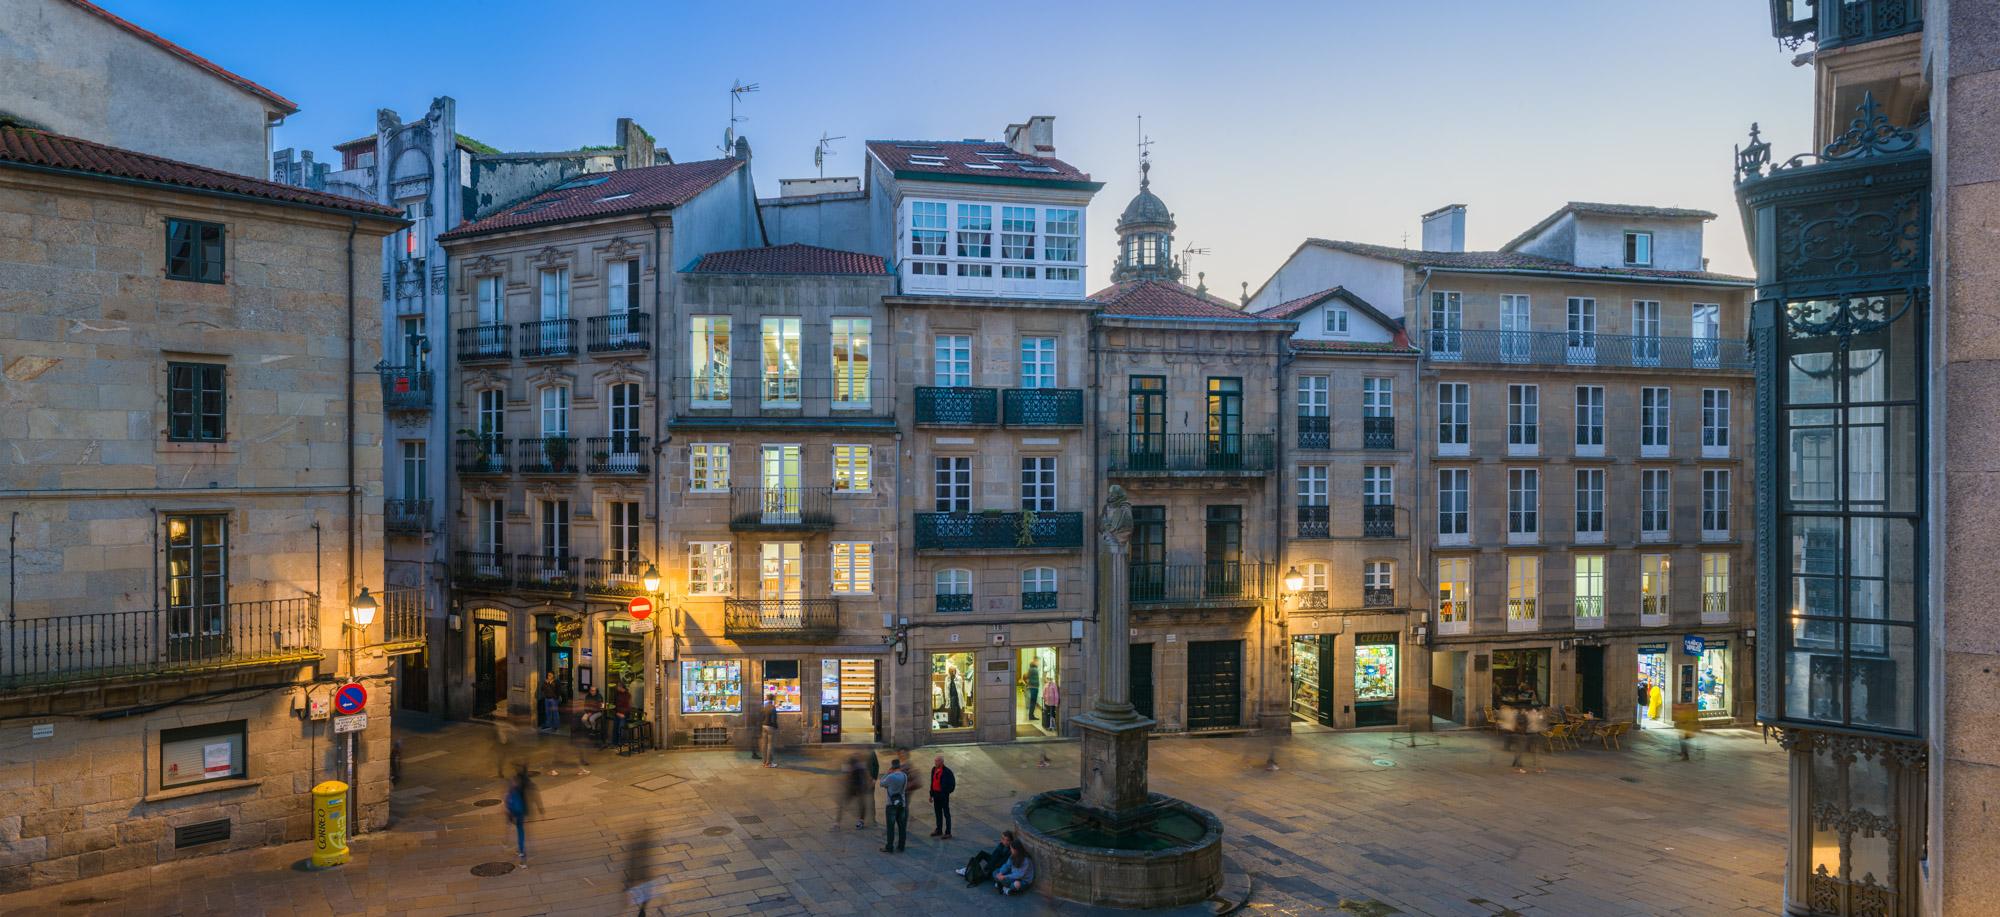 fotografía panorámica da Praza de Cervantes-Santiago de Compostela